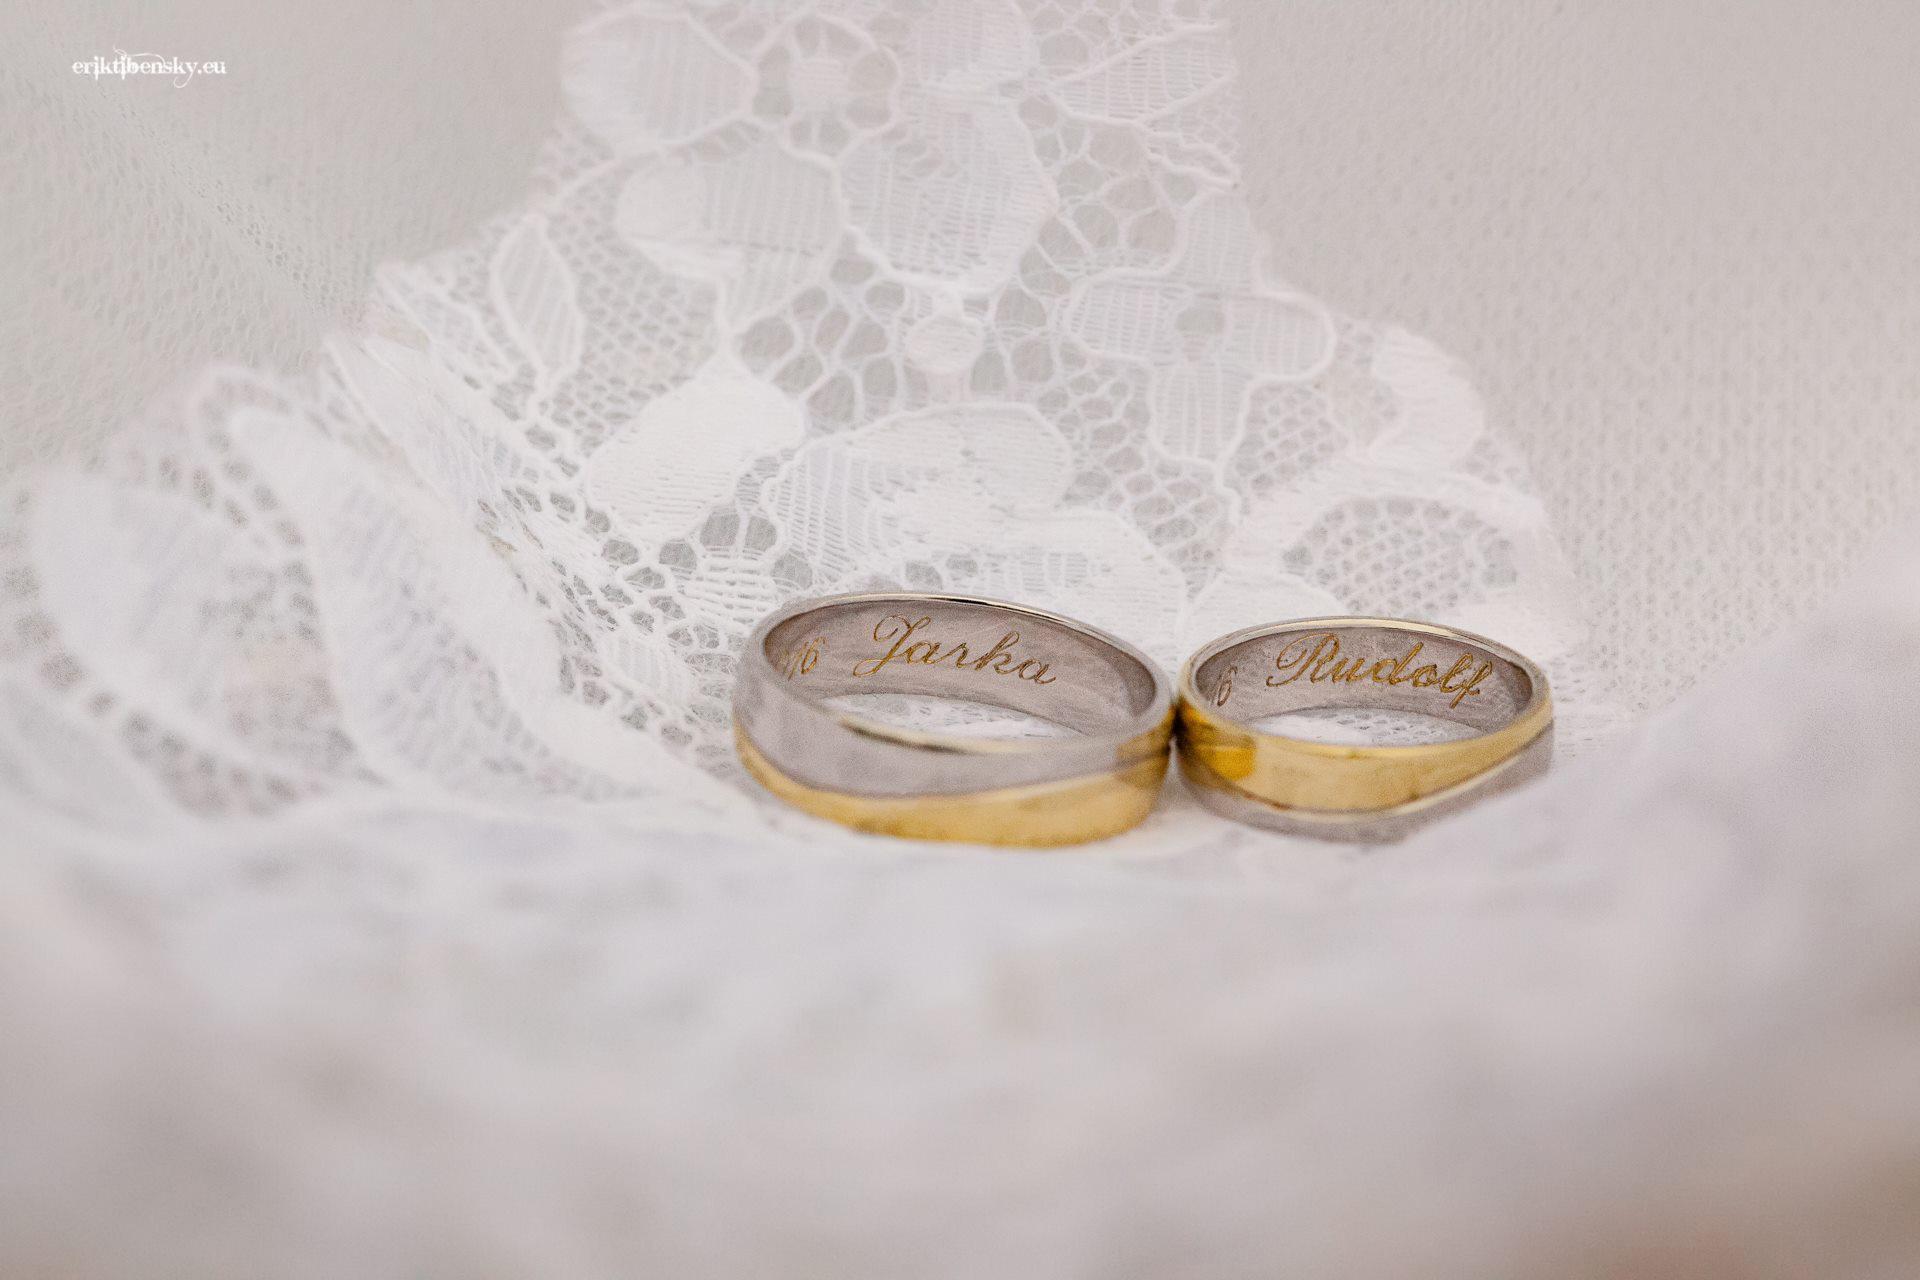 eriktibensky-eu-fotograf-wedding-photo-svadba-svadobny-pezinok-bratislava-modra-senec-1006a